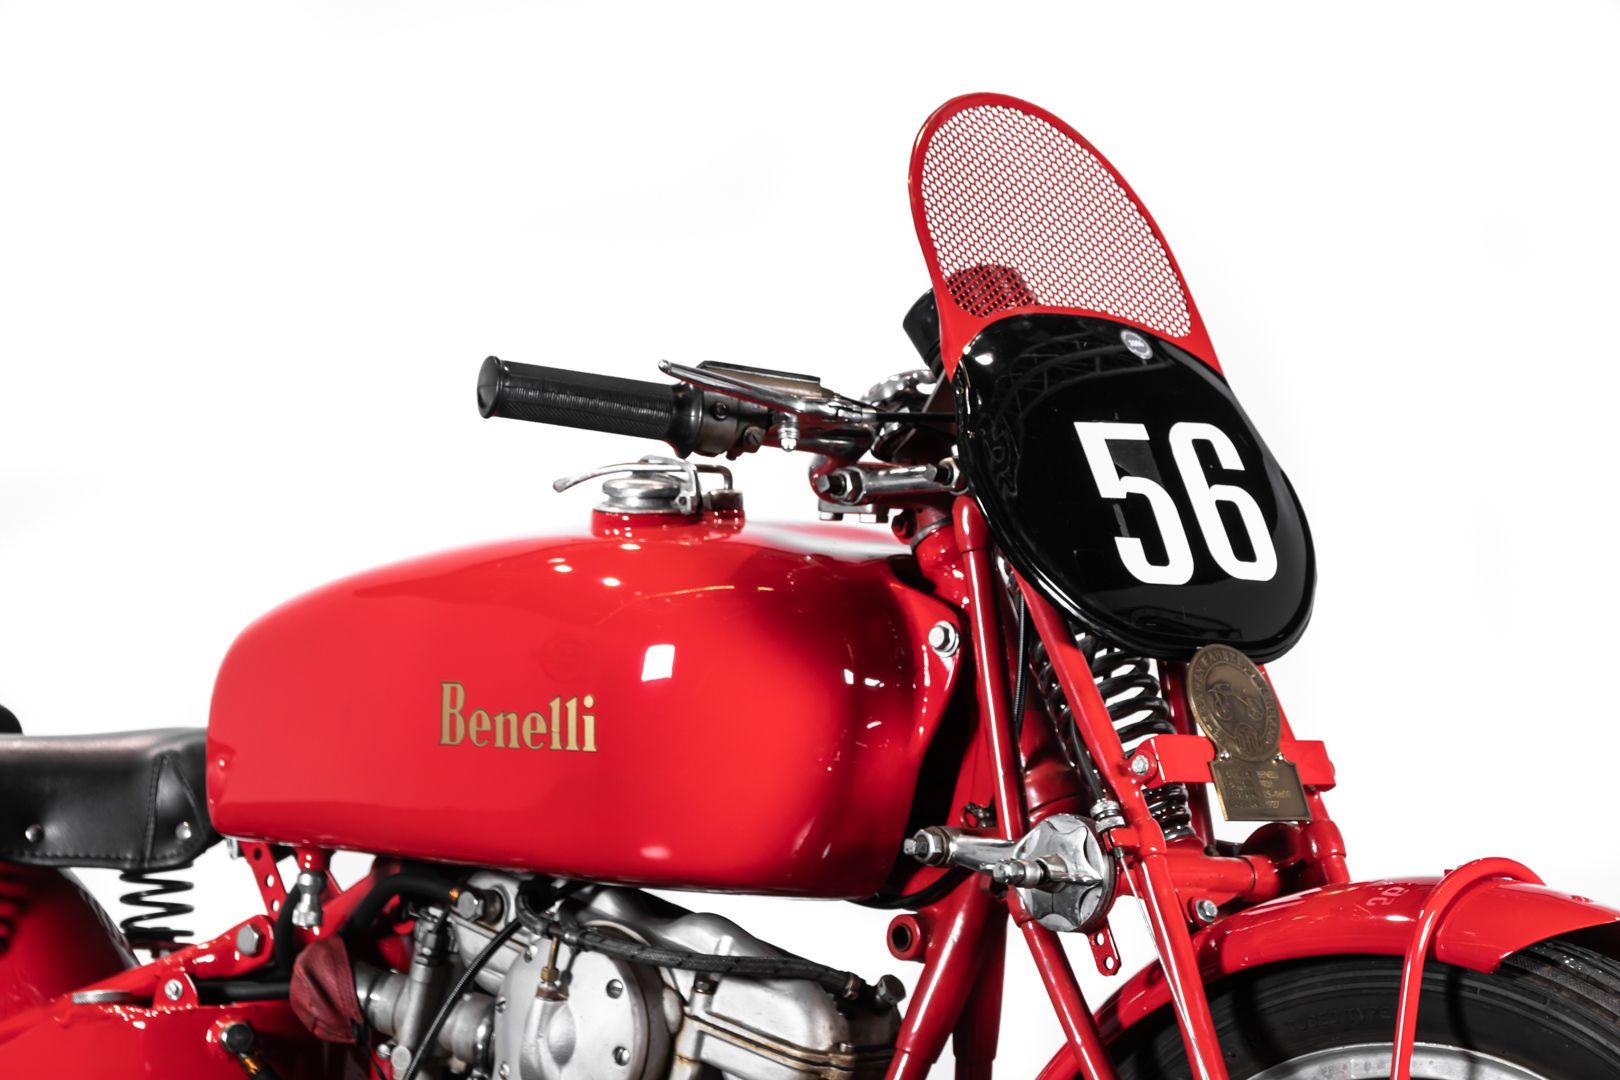 1938 Benelli 250 SS Bialbero 77293